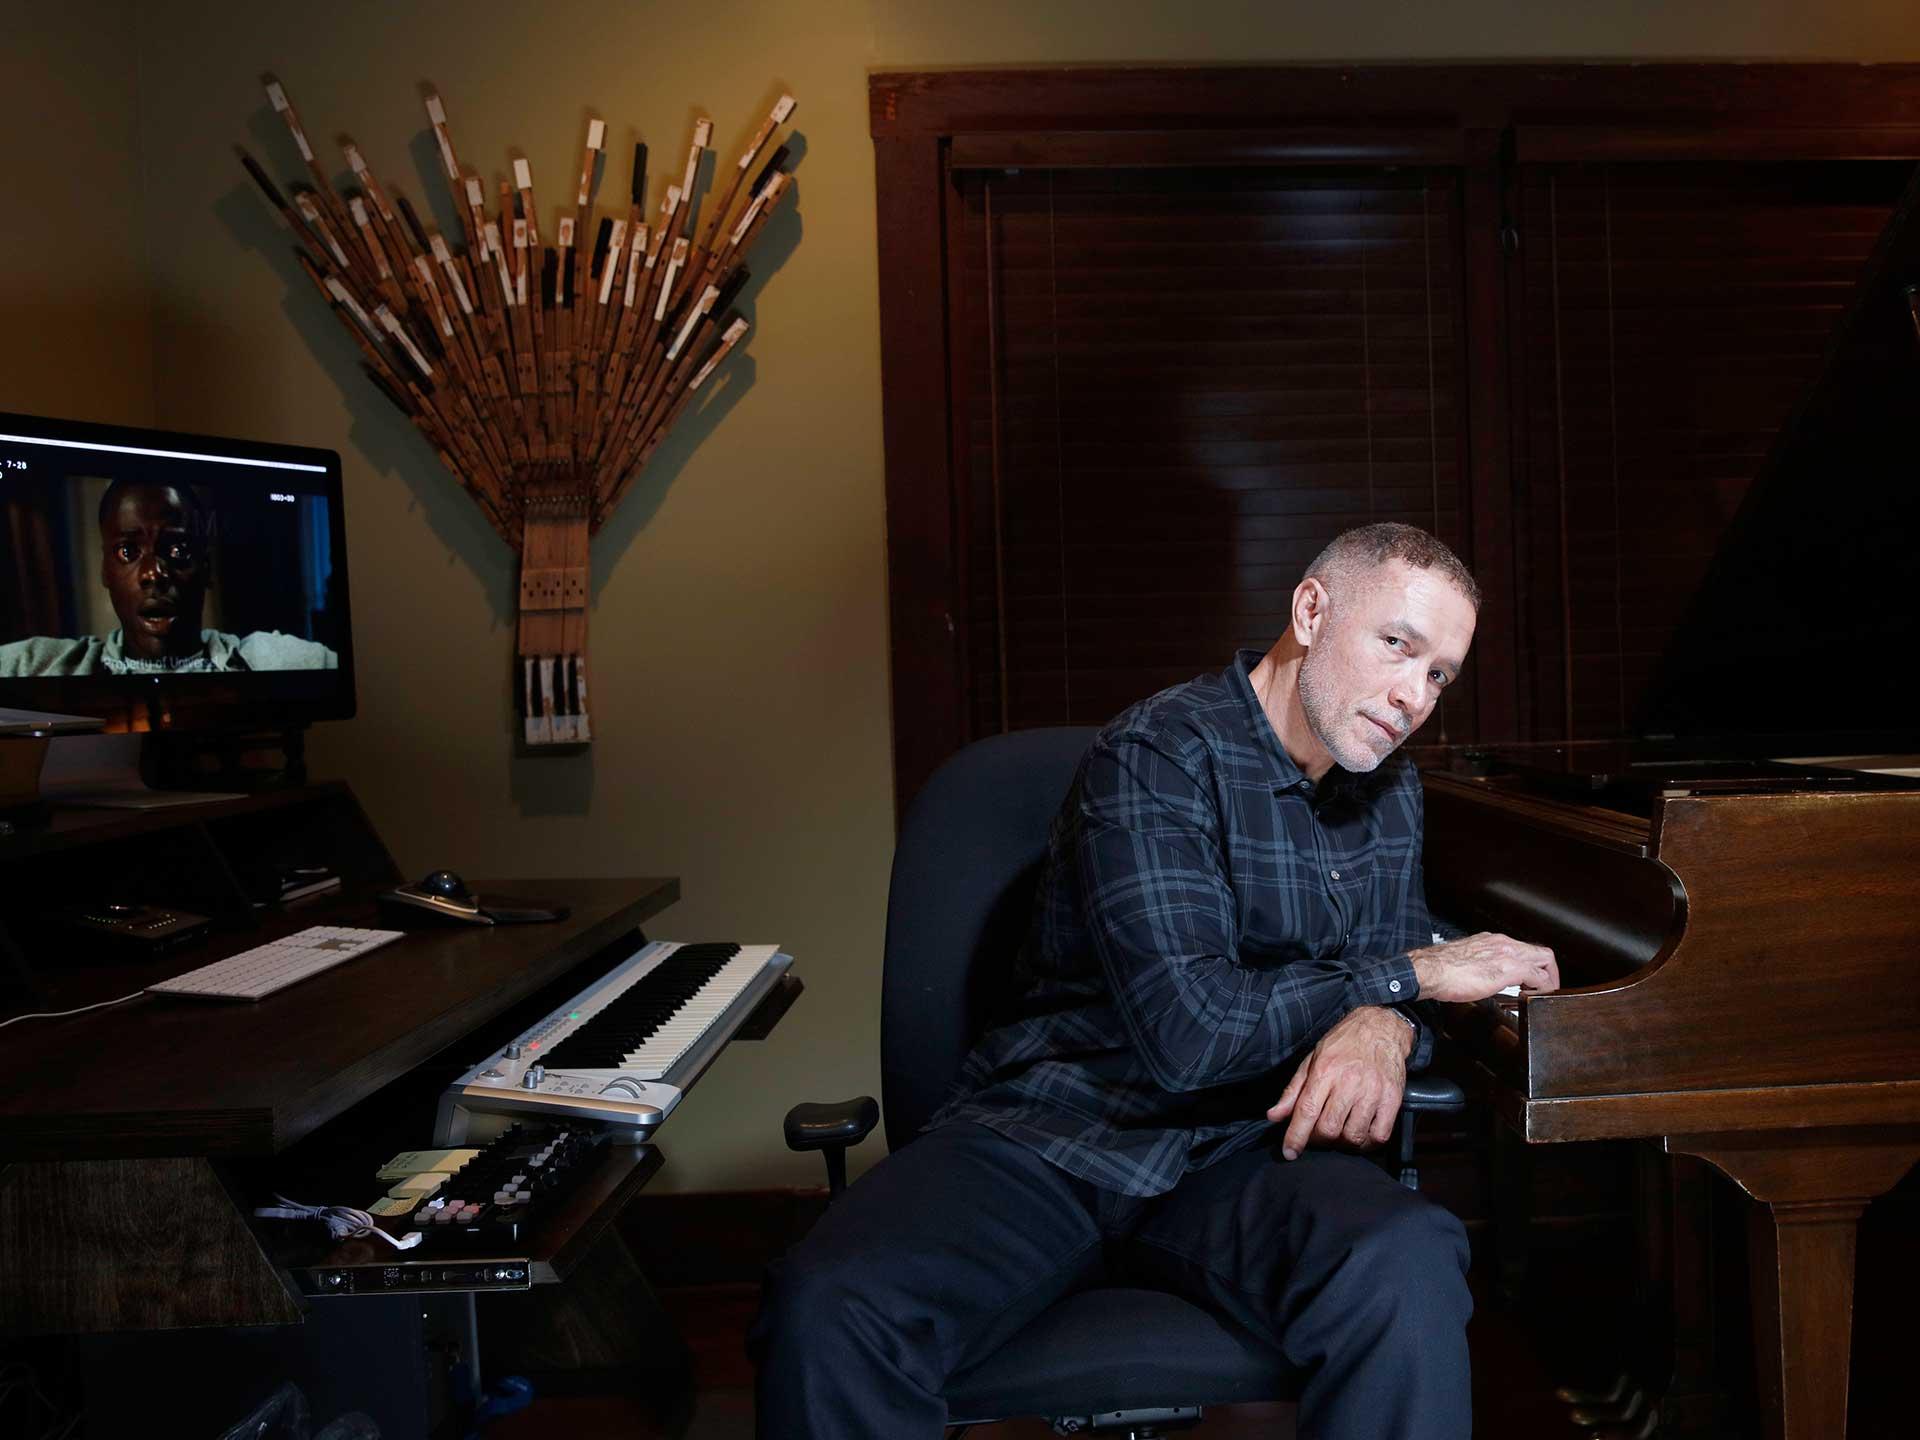 Image of Michael Abels at a piano.